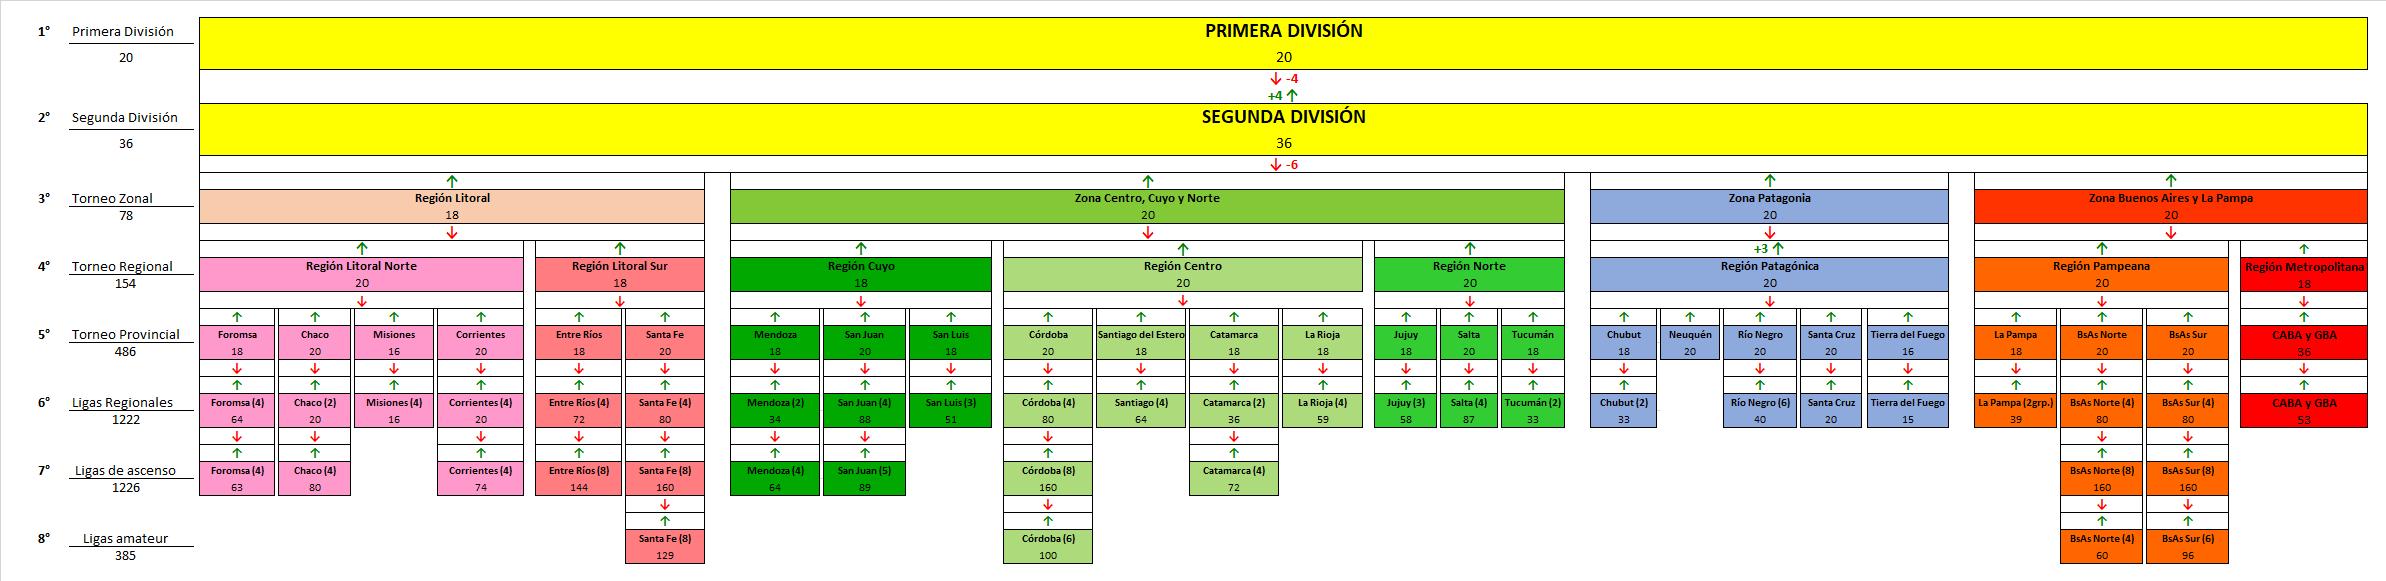 [FM20] Estructura argentina regionalizada (8 niveles, 3660 clubes)